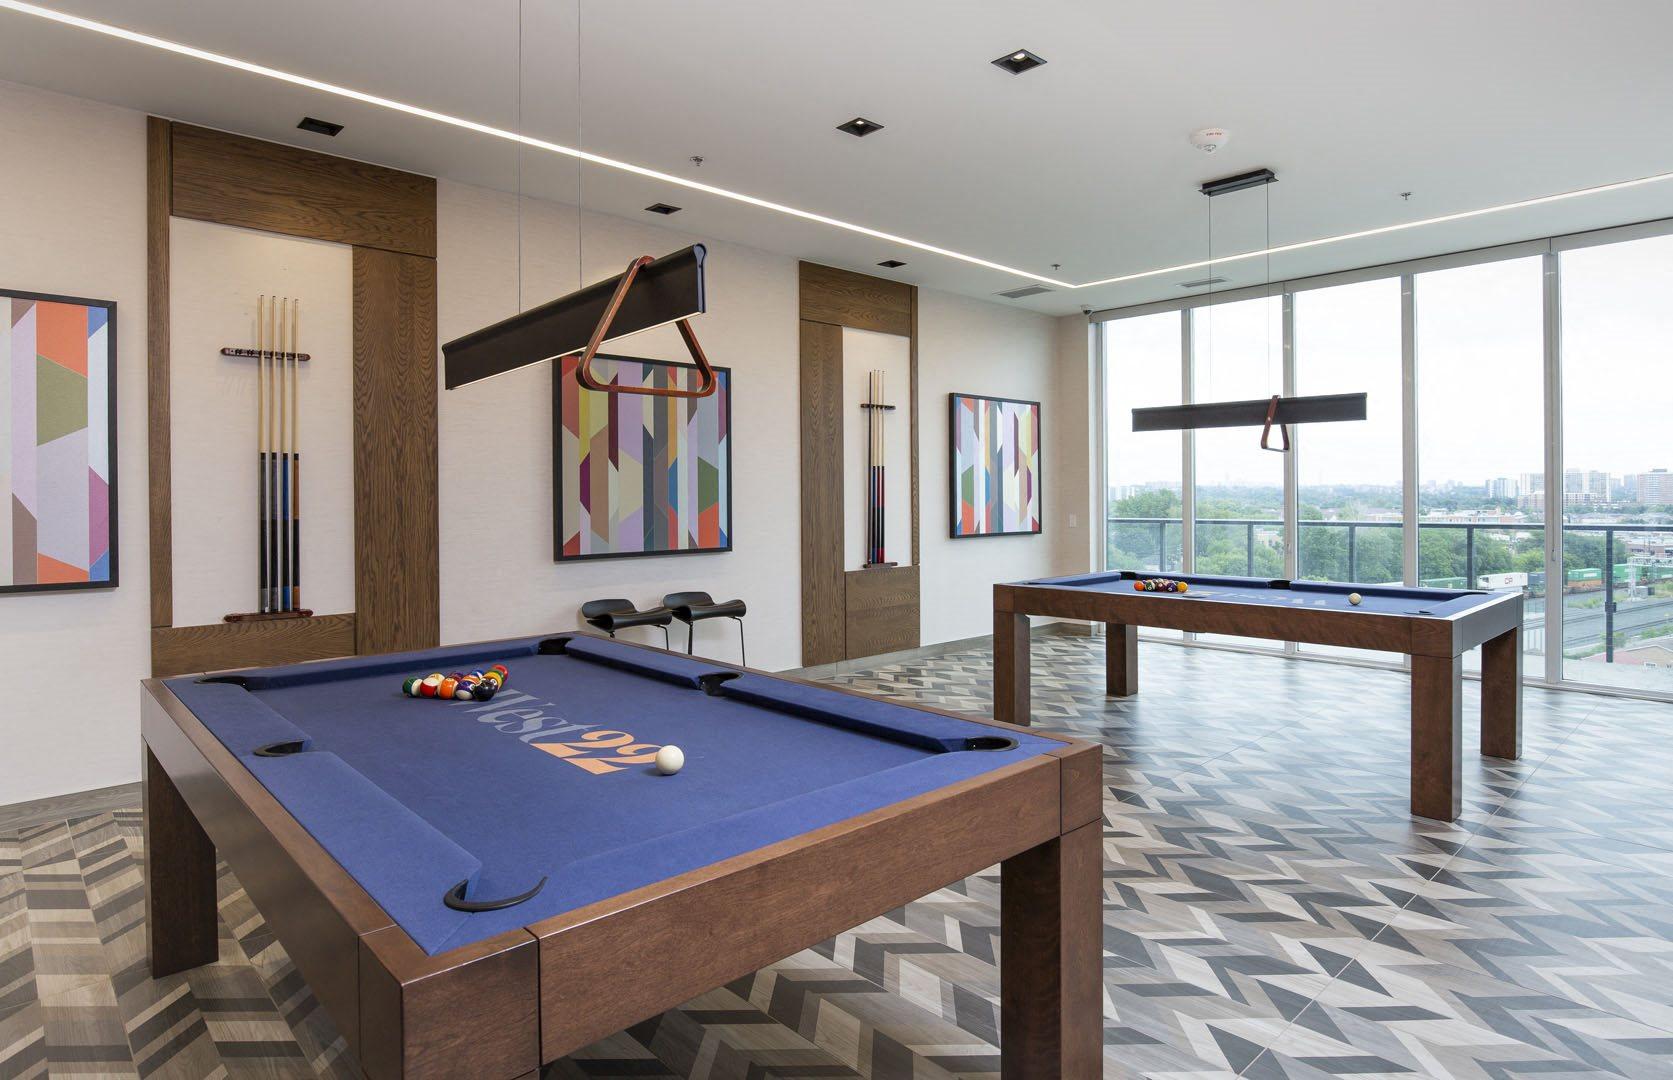 West22 Amenity - Games Room